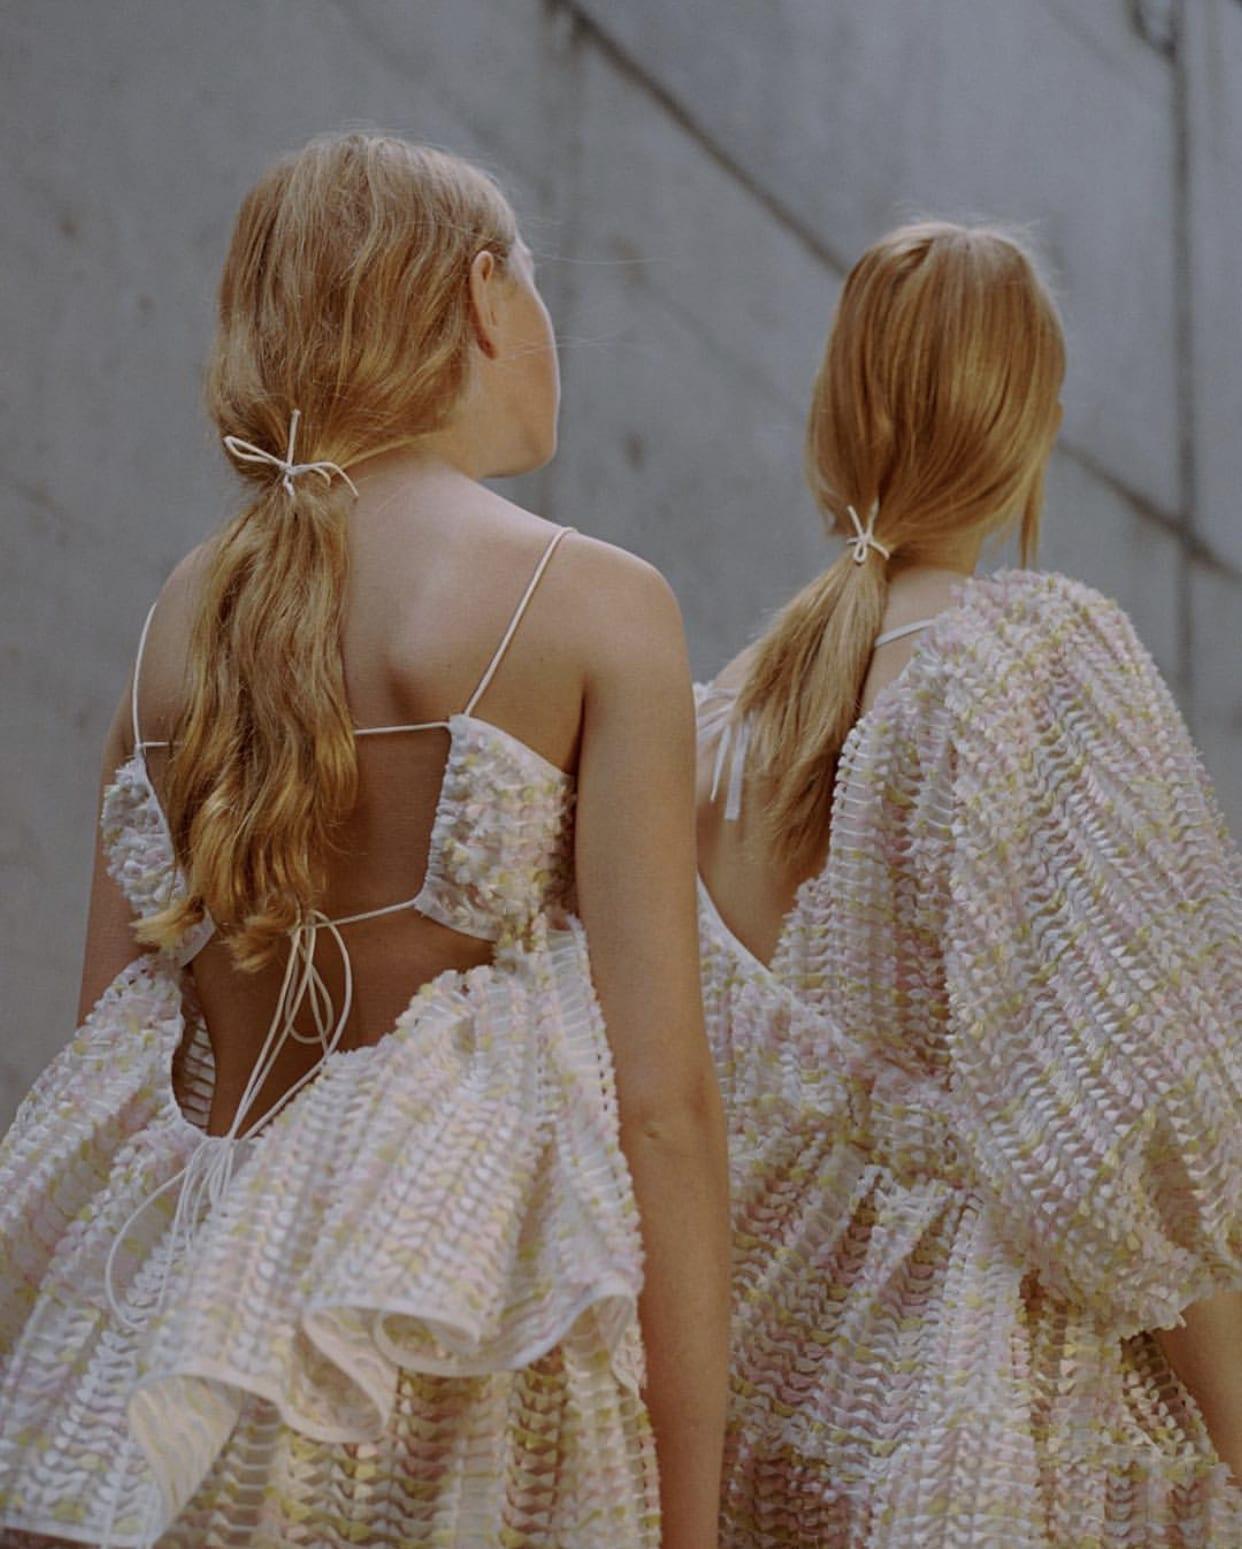 Nuovi marchi moda 2019, copenhagen fashion week 2019